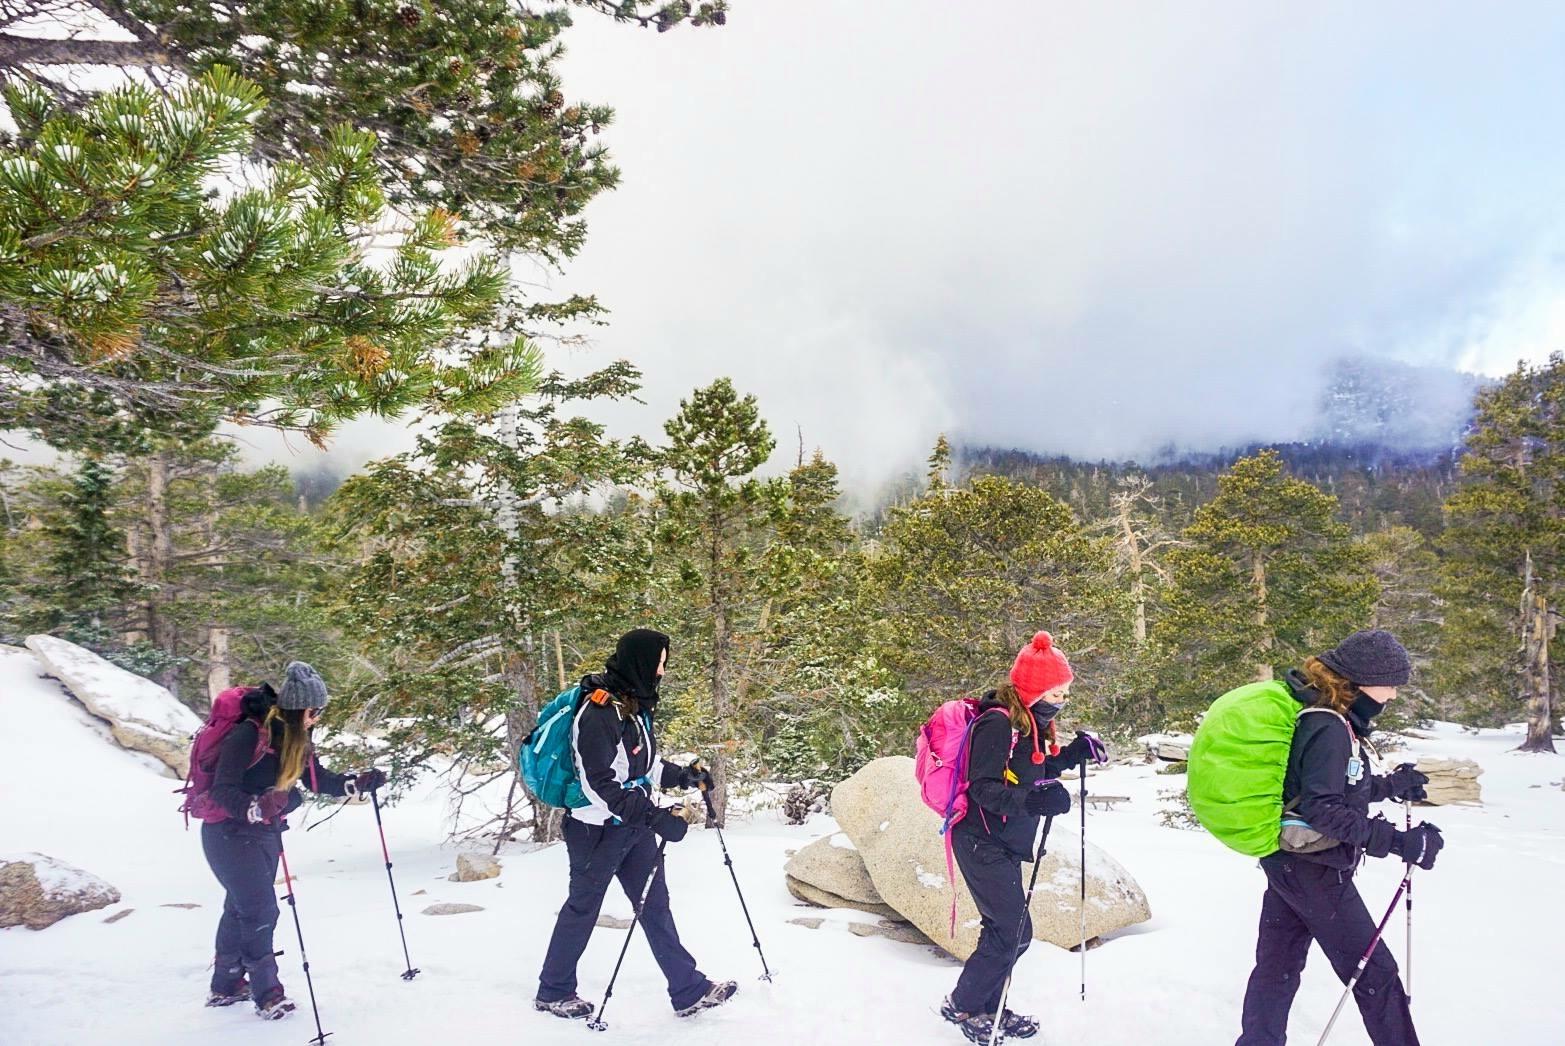 January 2018: GirlsWhoHike Snow Hike in San Jacinto Wilderness to Wellman's Divide